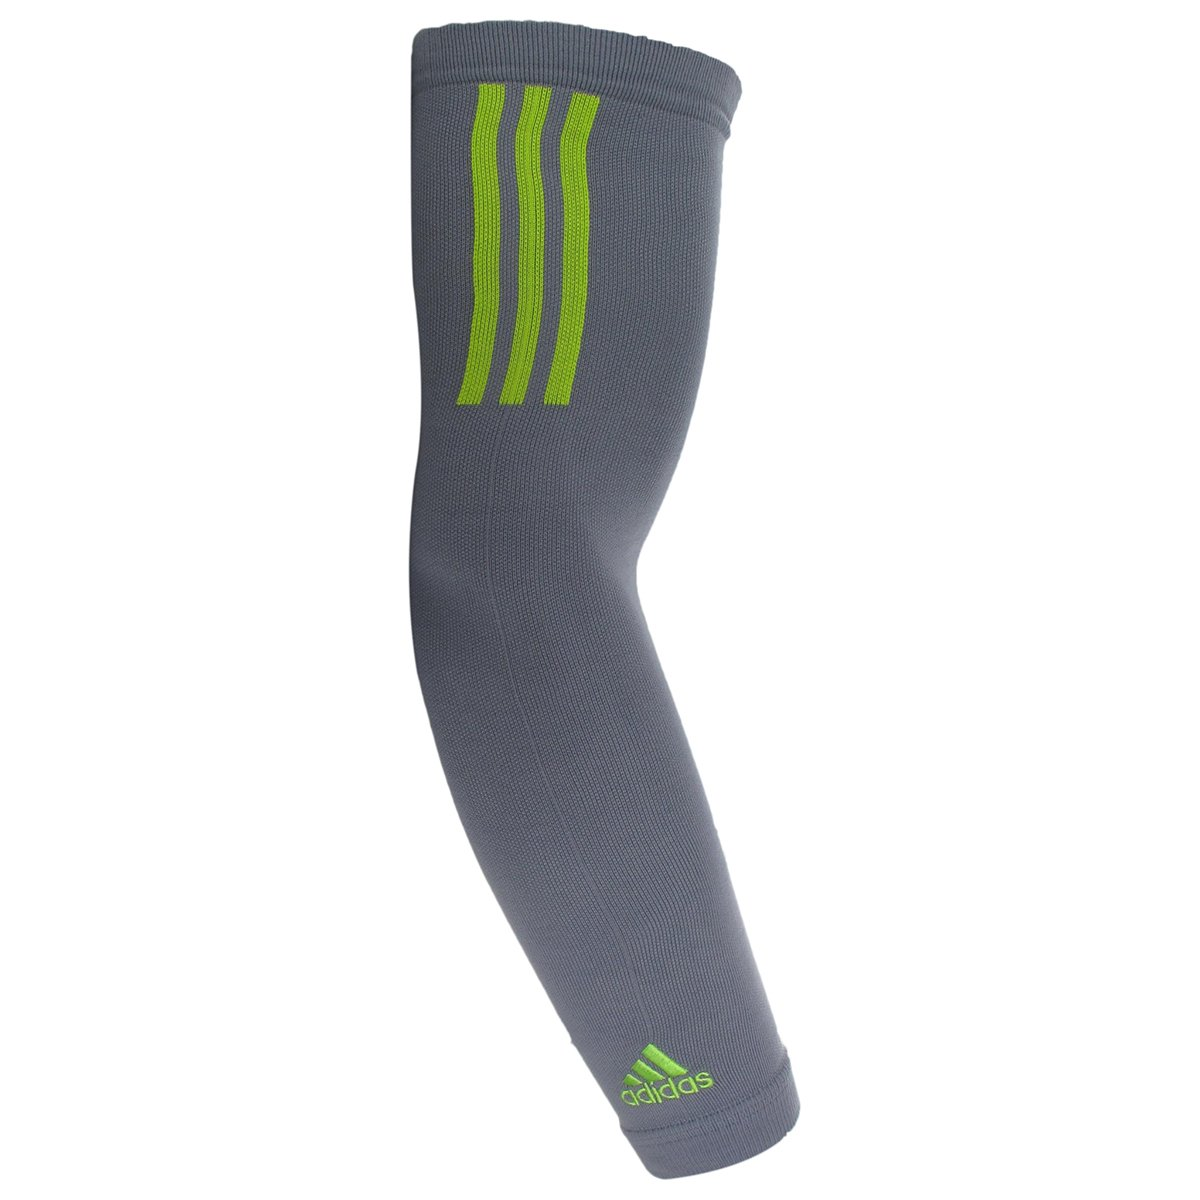 Amazon.com : adidas Compression Arm Sleeve : Sports Wristbands